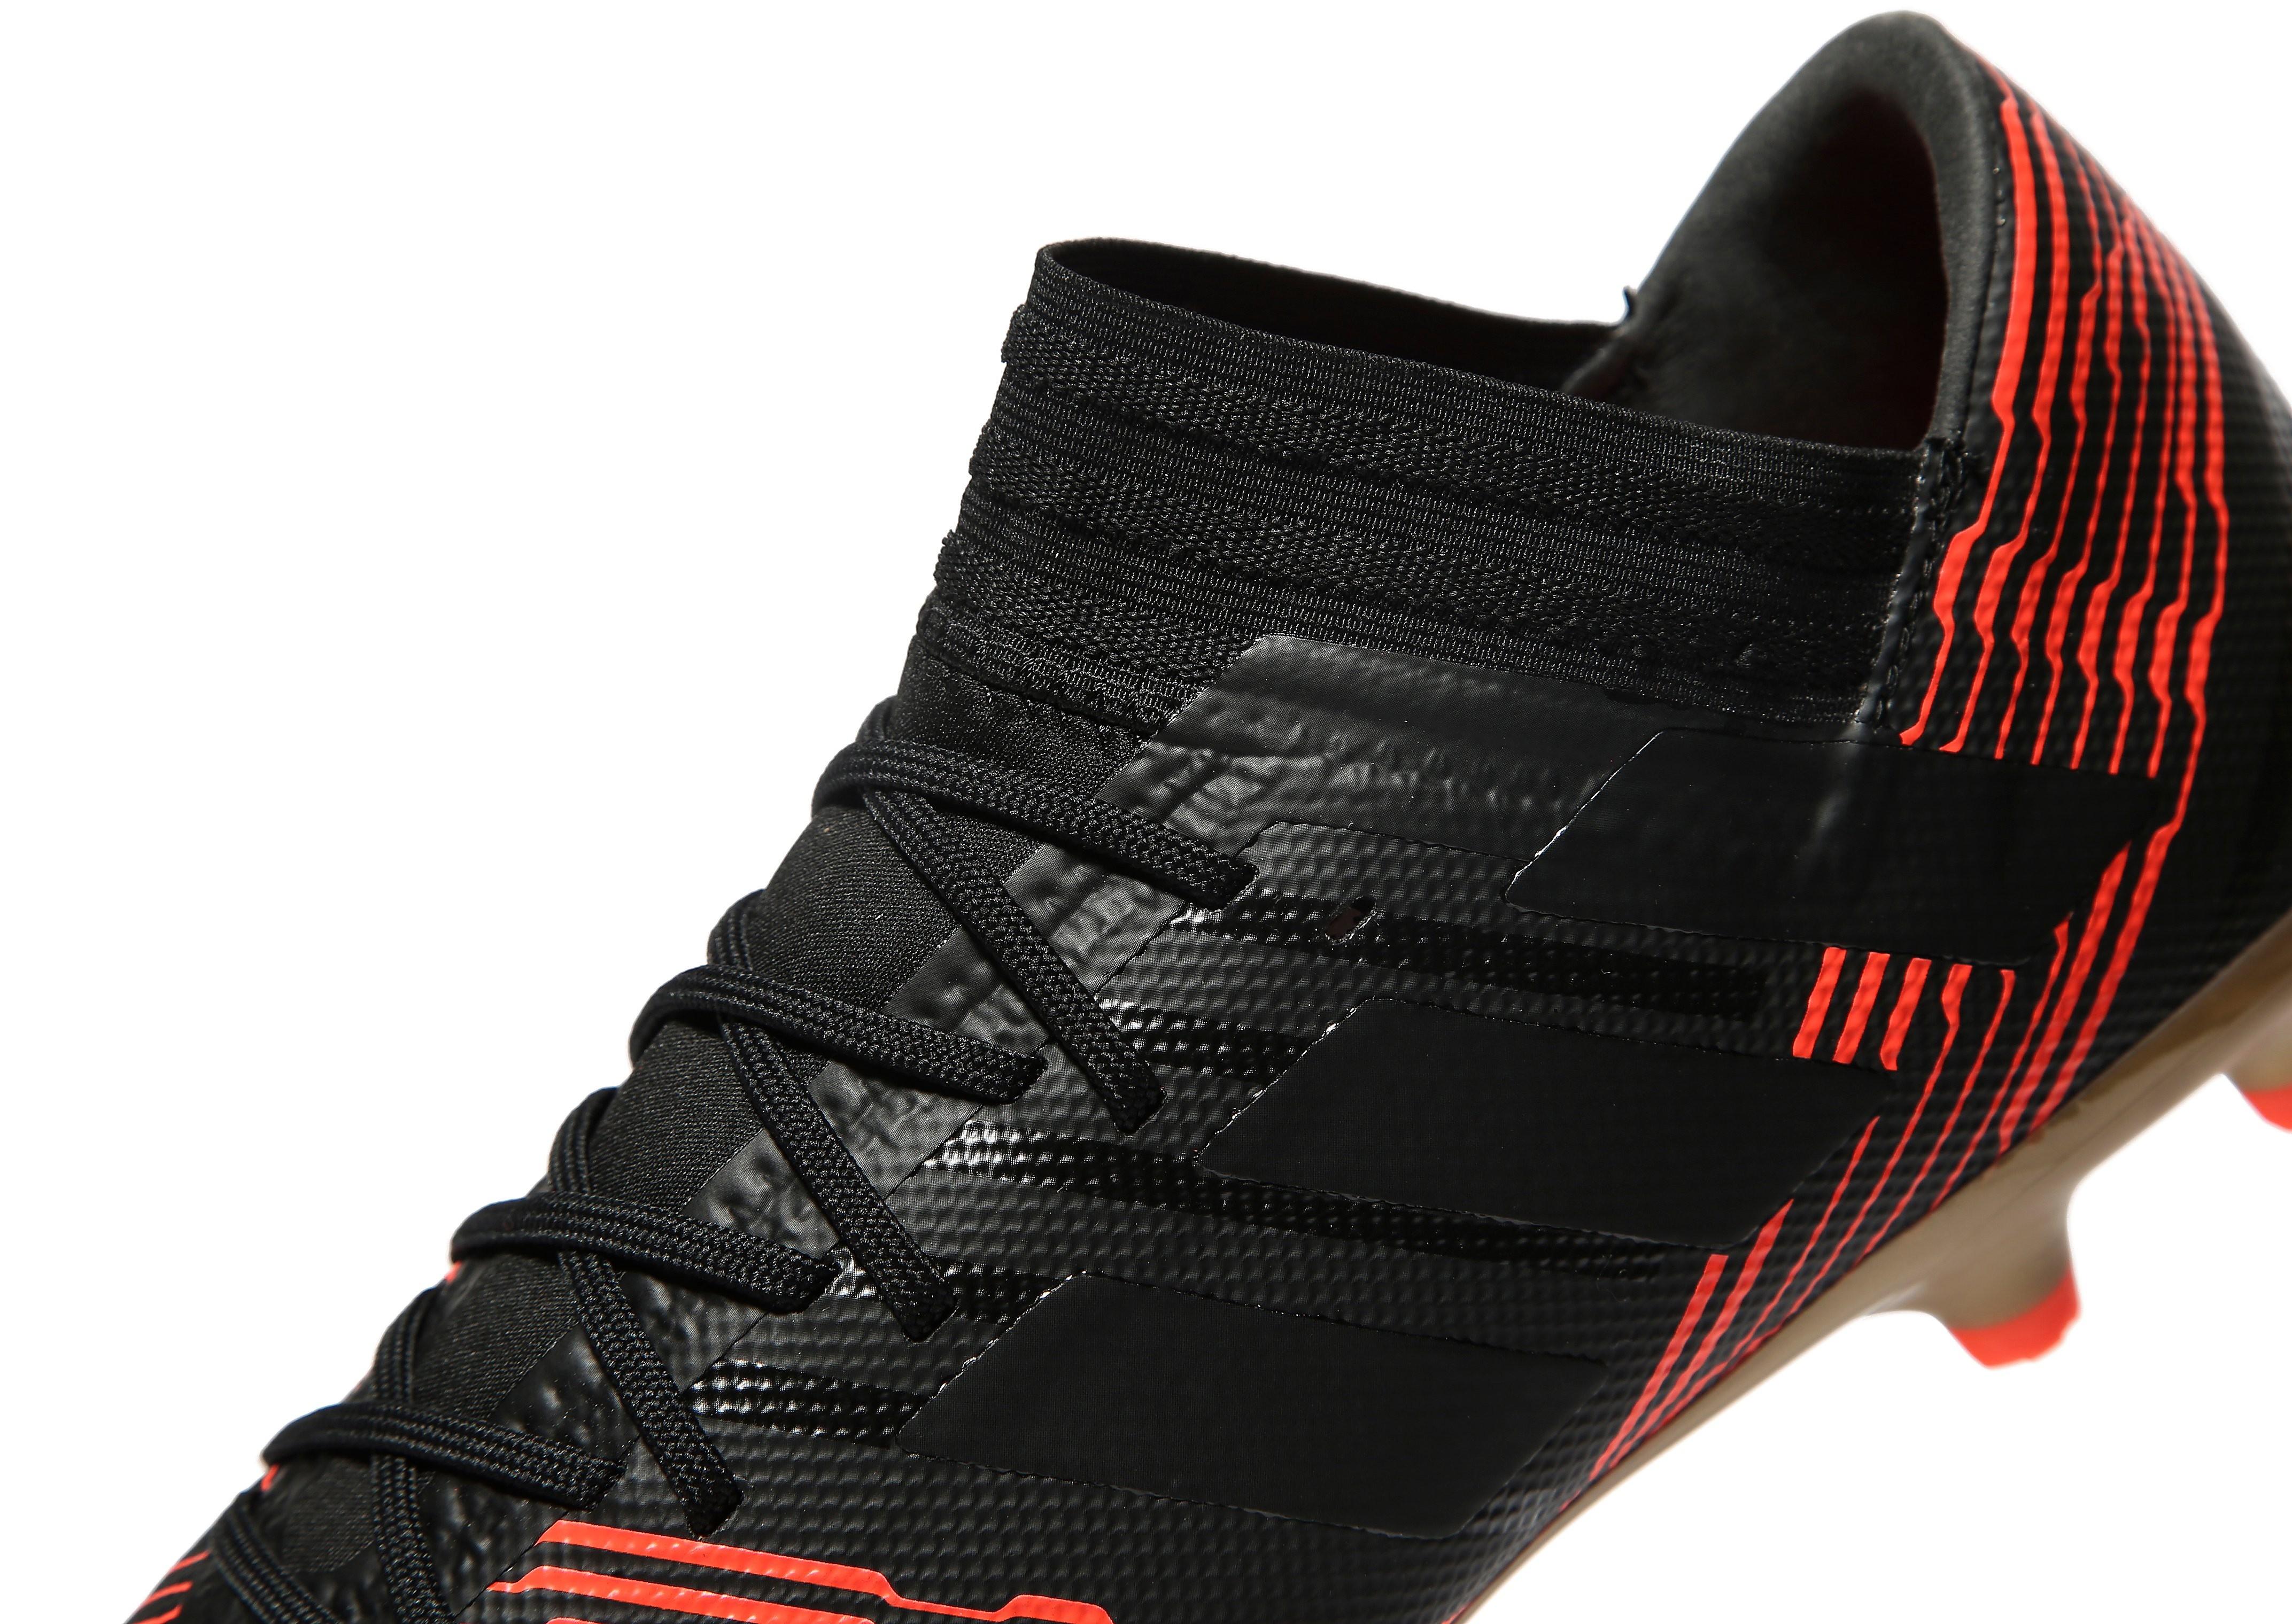 adidas SkyStalker Nemeziz 17.3 FG